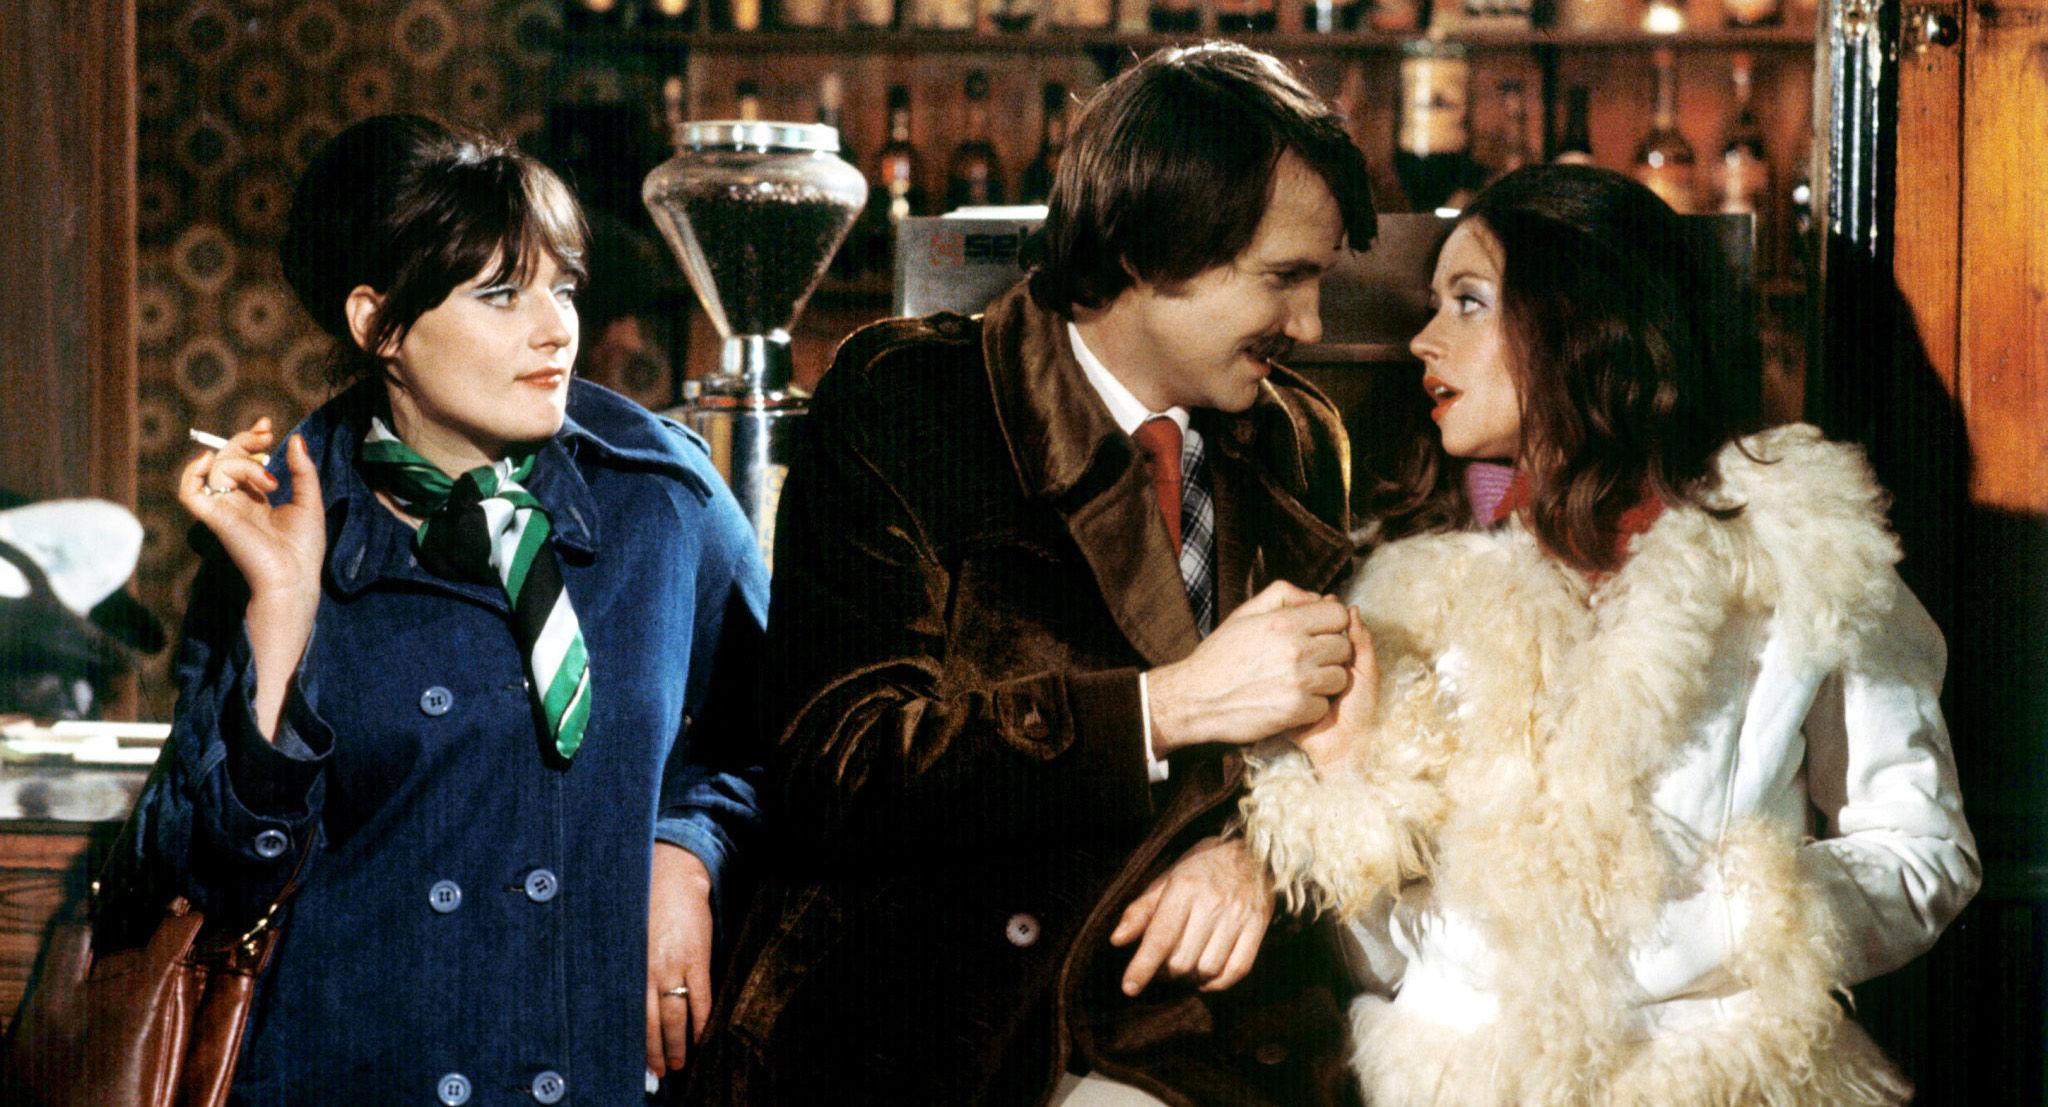 Leichtes Mädchen (Brigitte Swoboda), Karli (Klaus Rott), Helga (Gunda König)